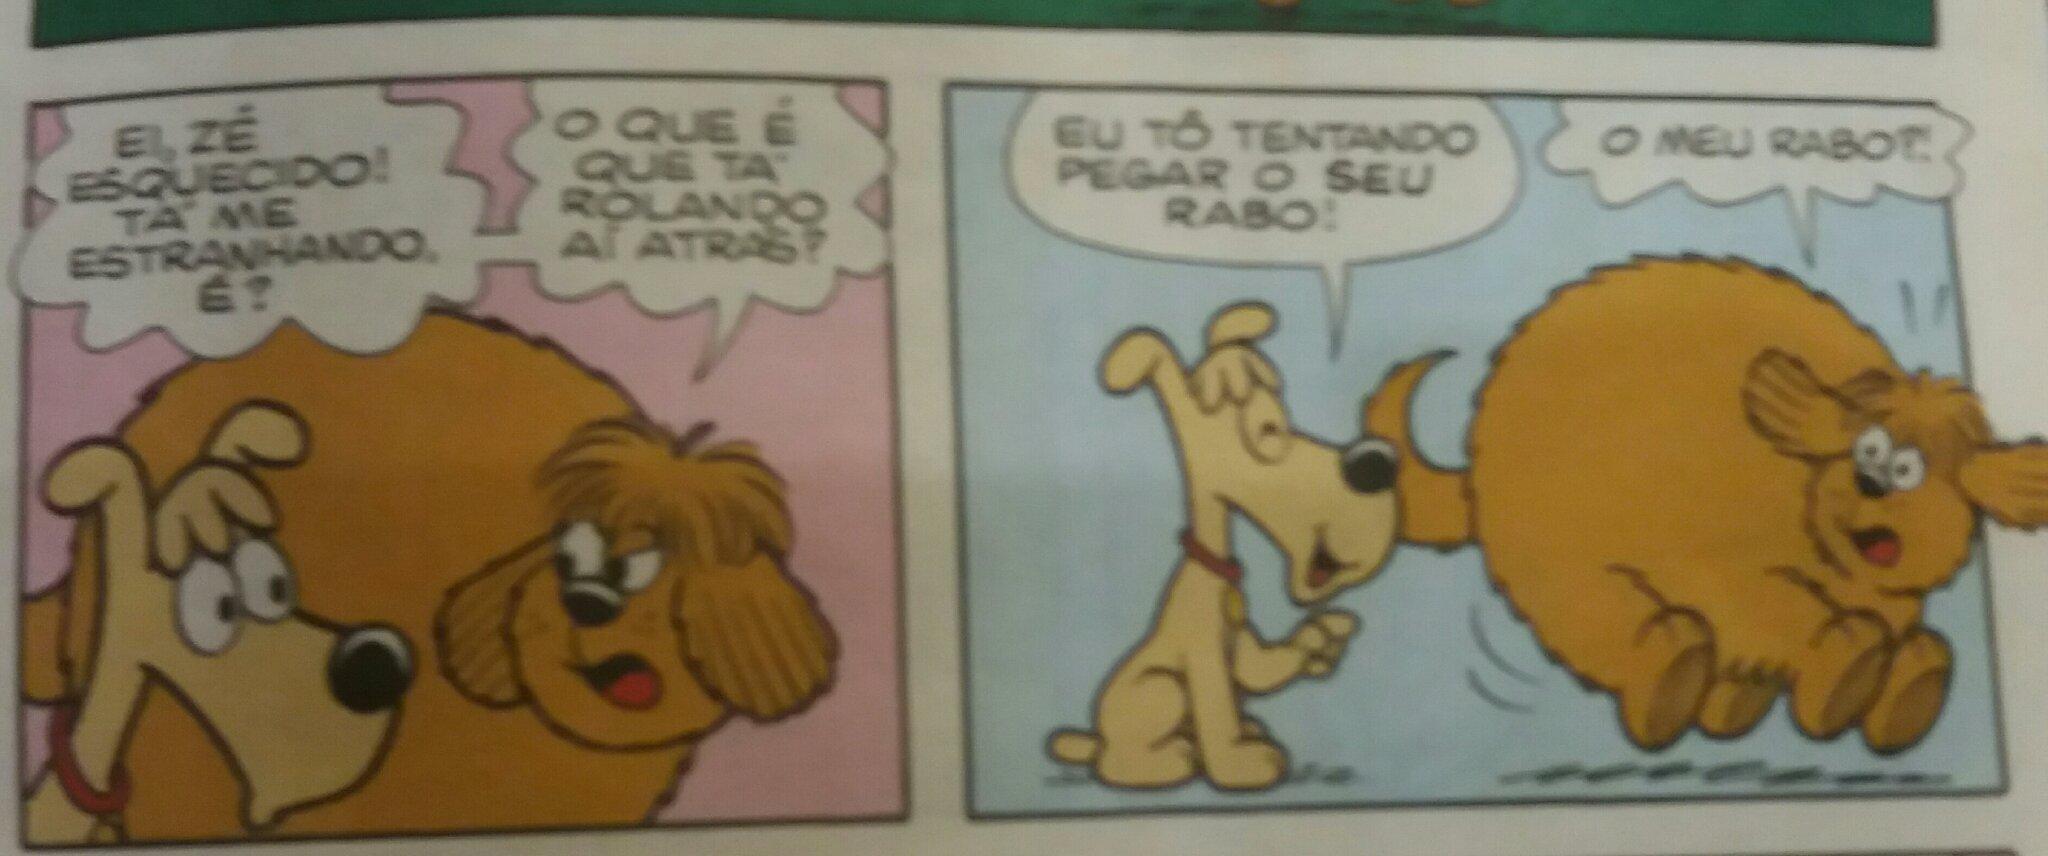 Maurisio de Souza - meme